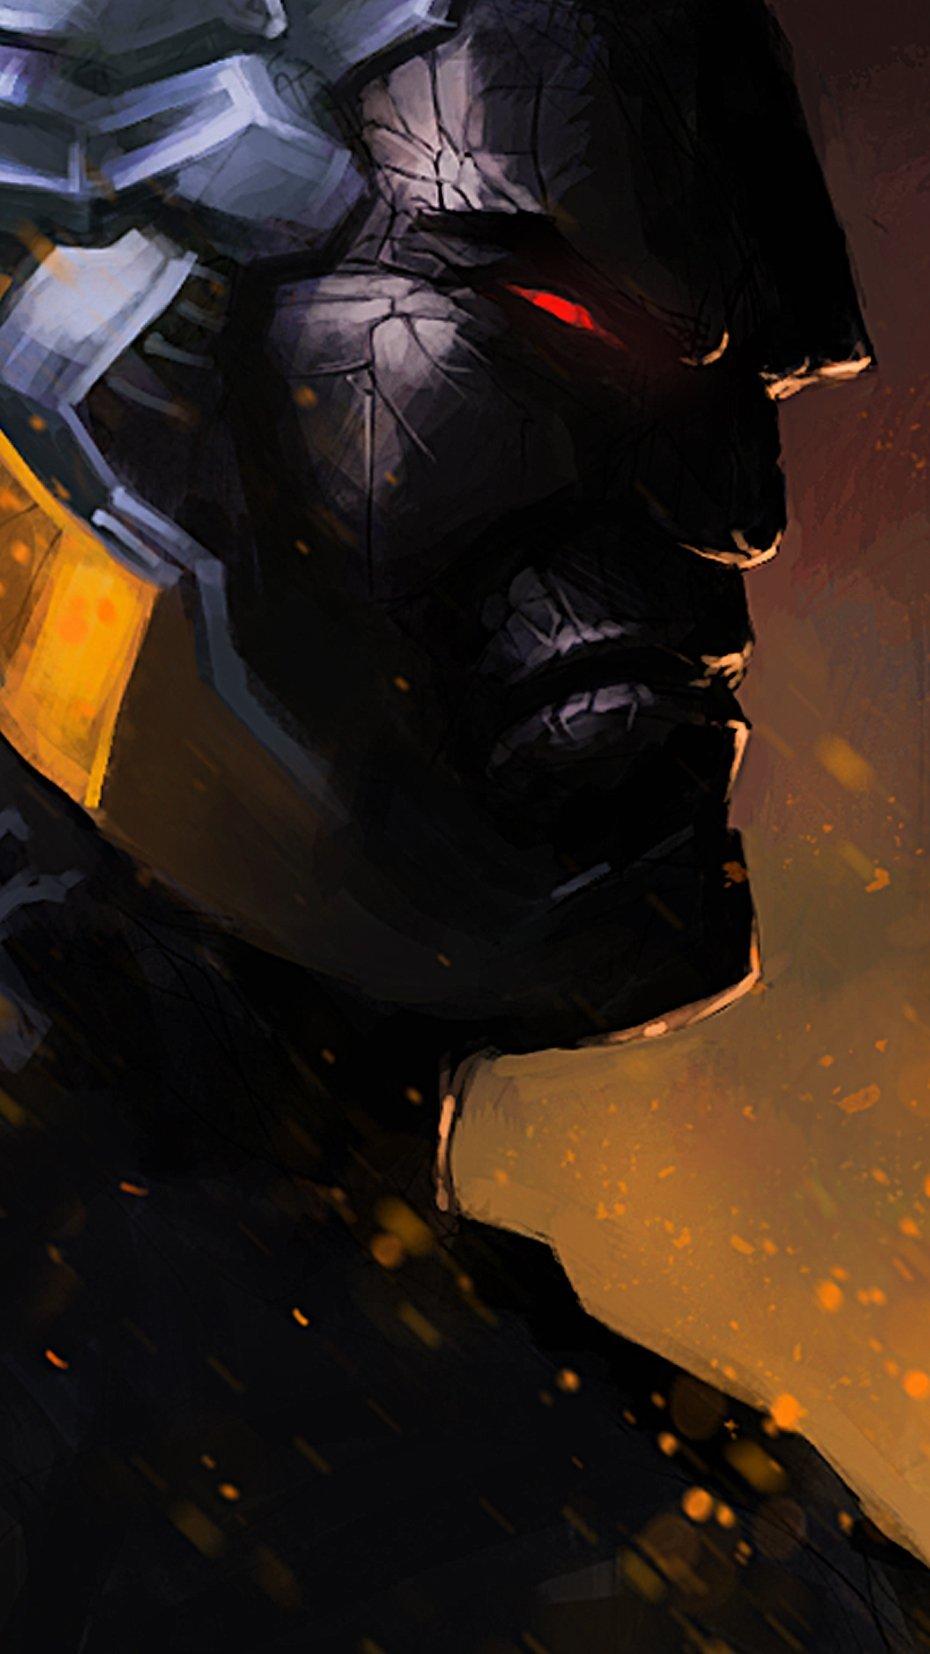 Fondos de pantalla Darkseid Vertical